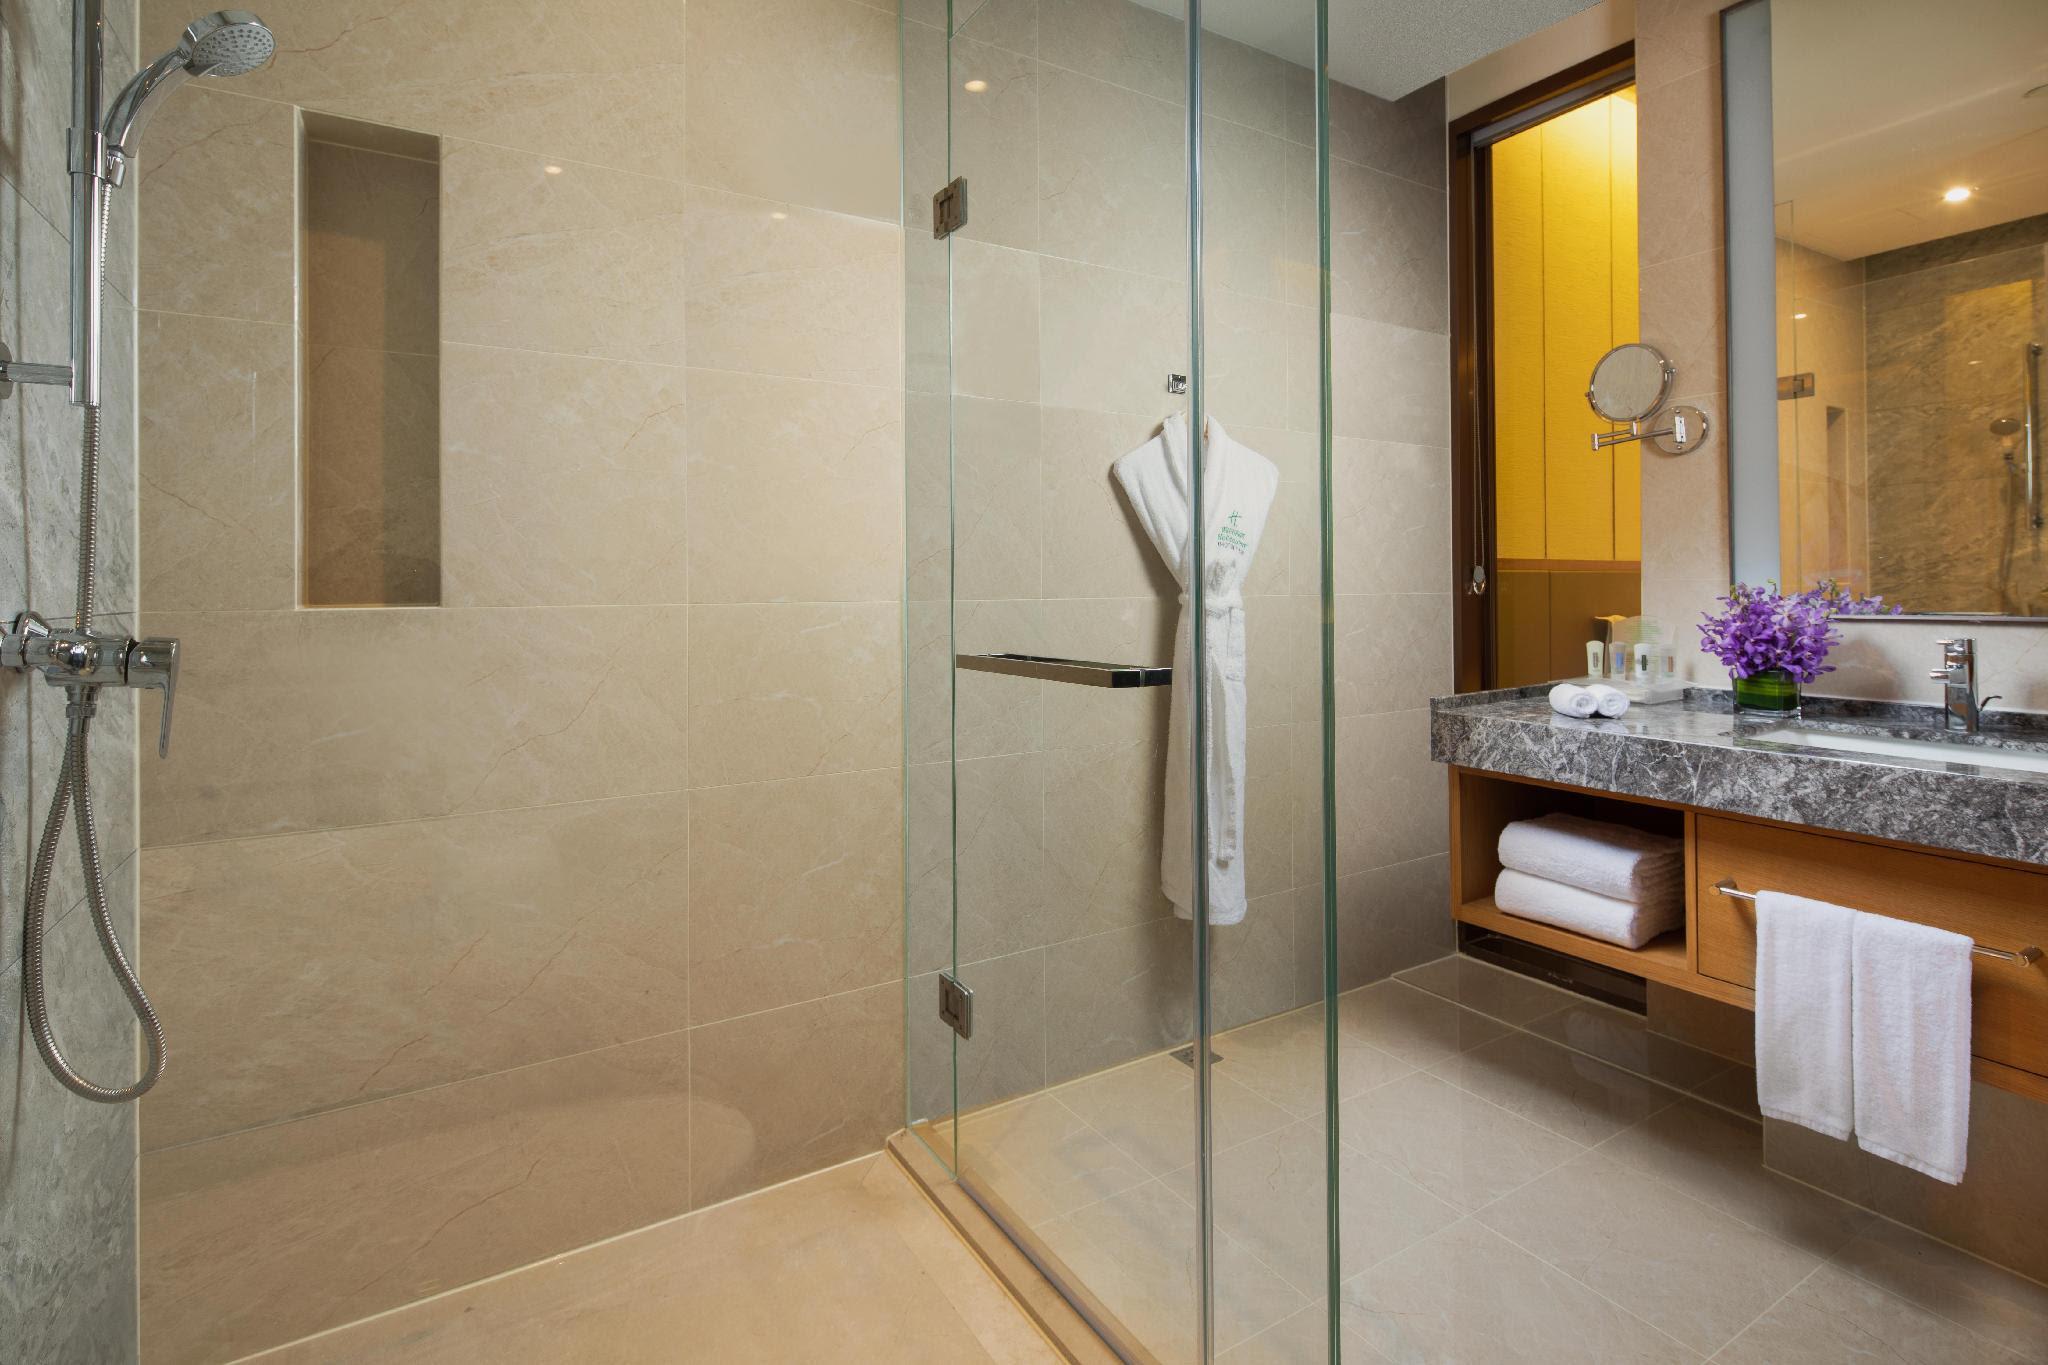 Holiday Inn Kunshan Huaqiao Reviews